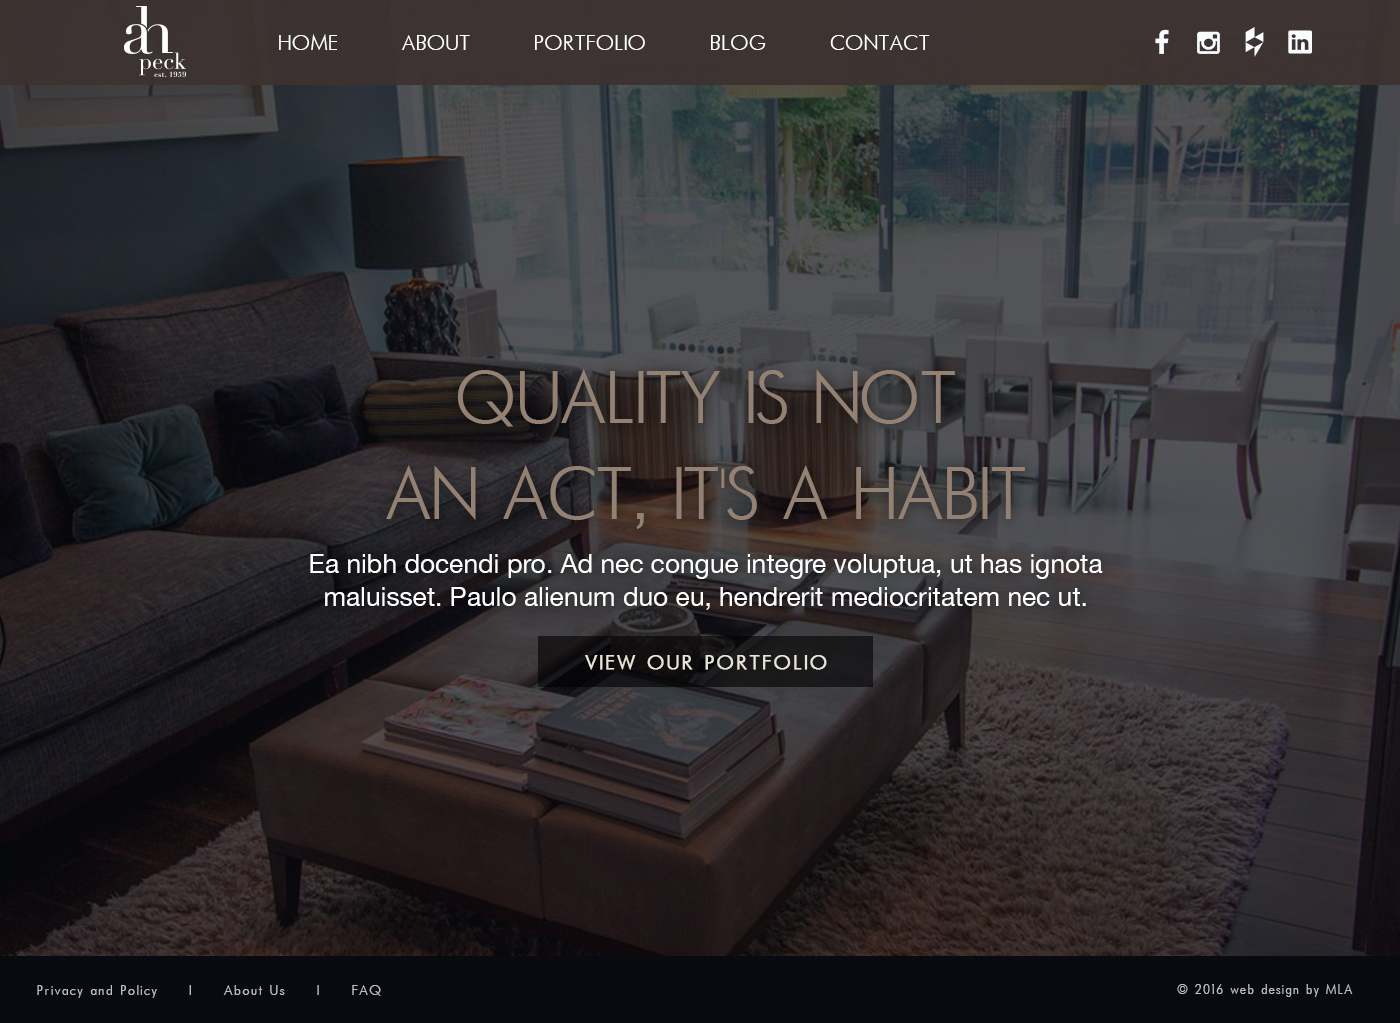 A.H Peck homepage design